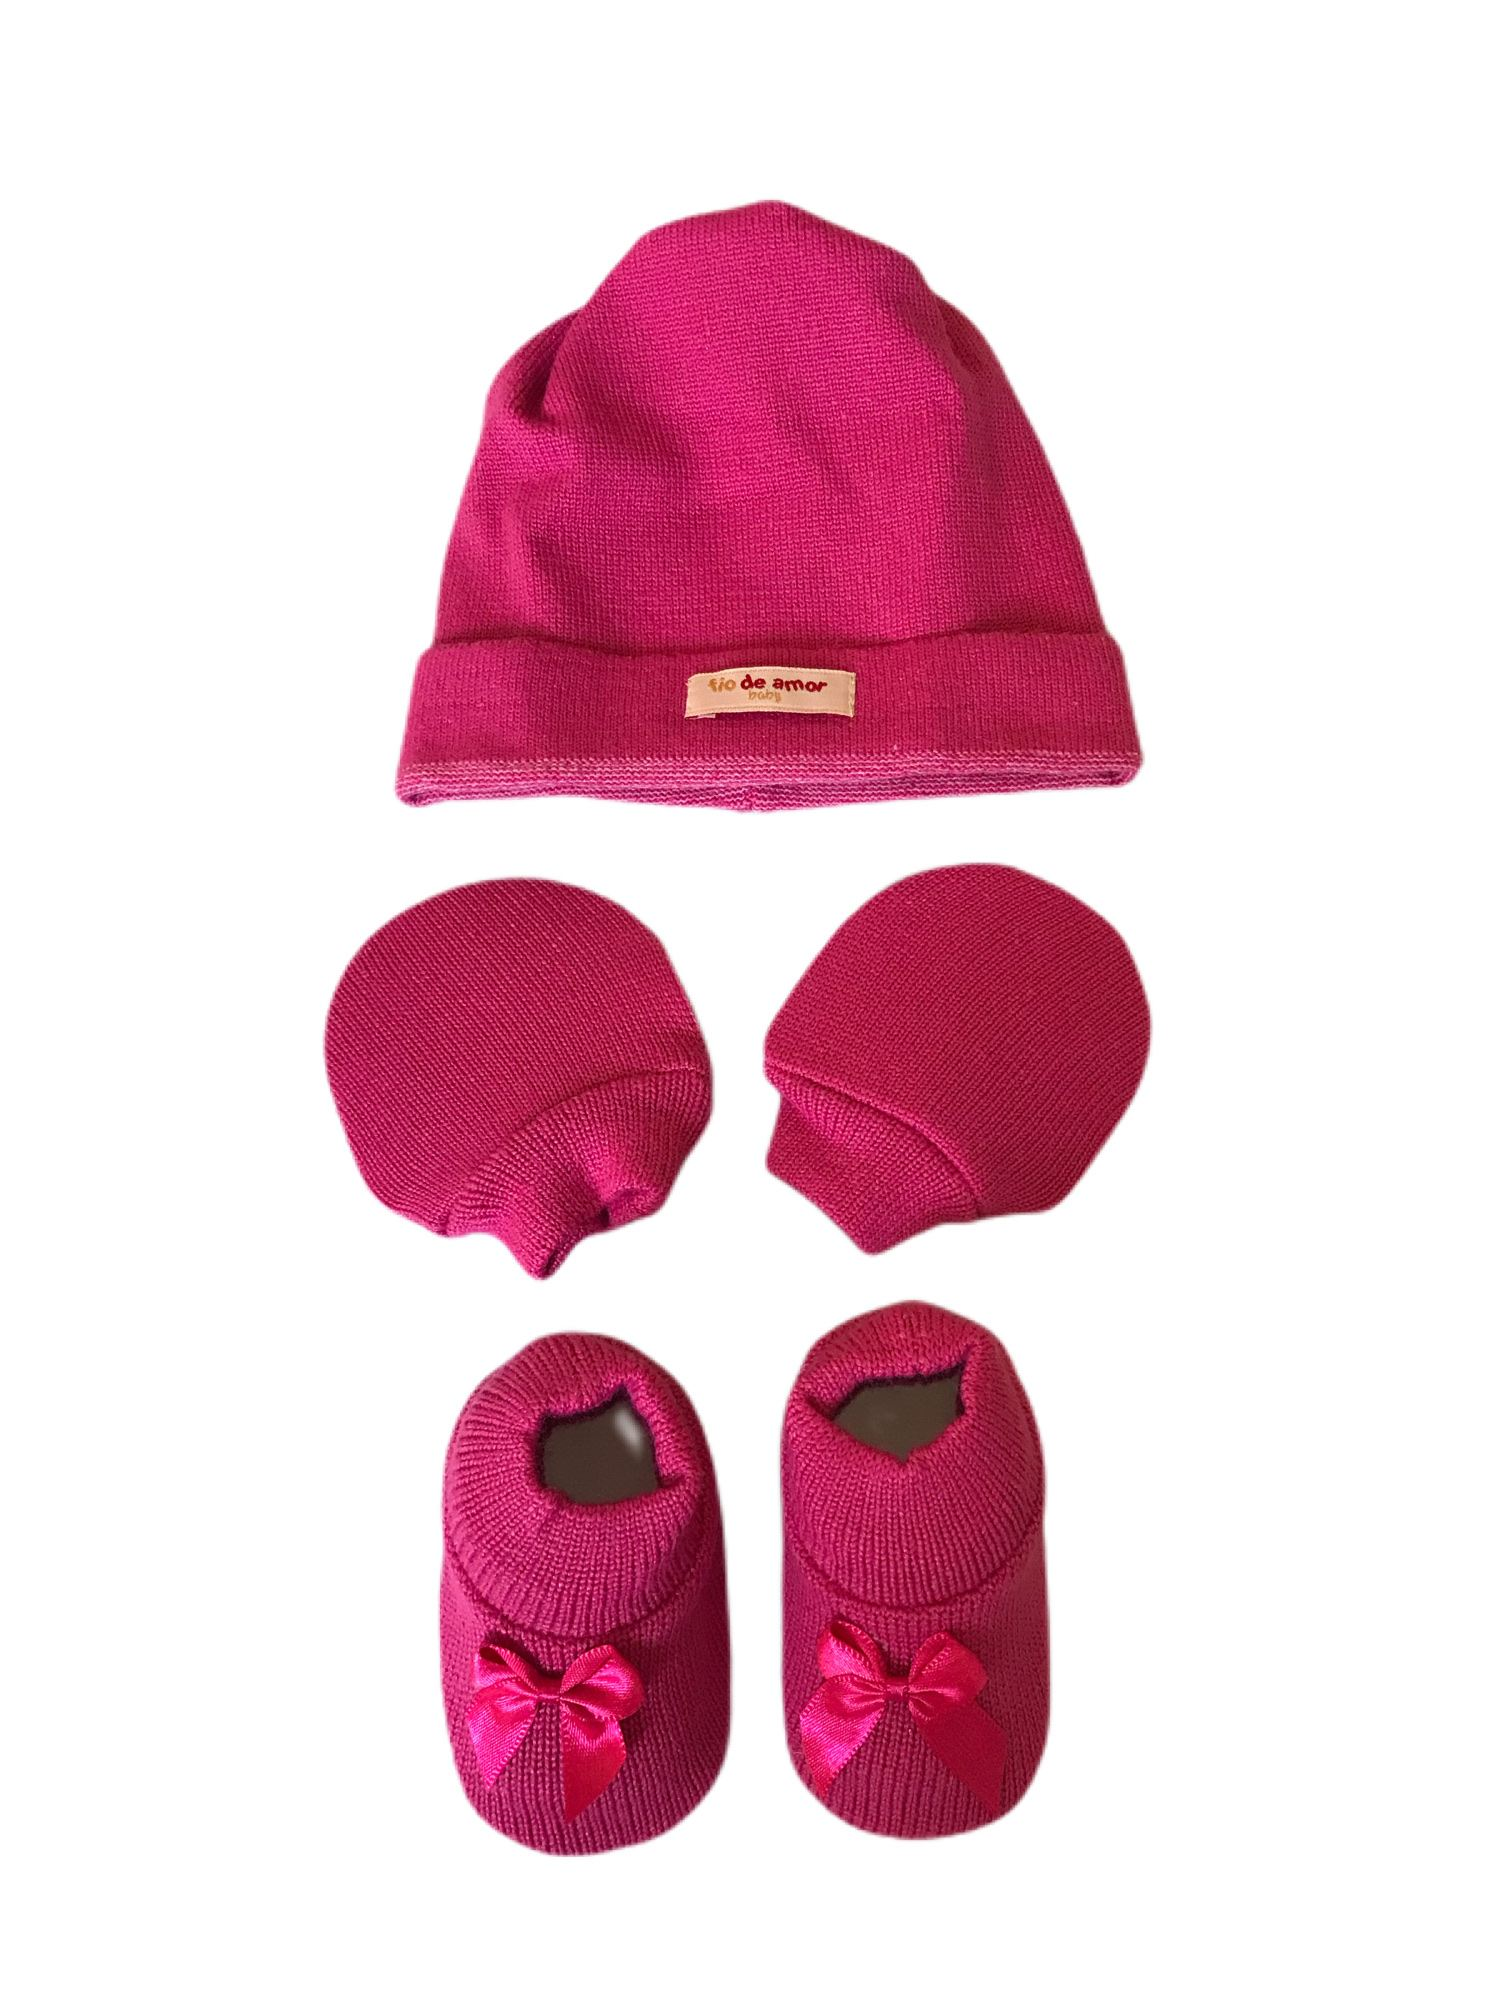 Kit Sapatinho + Luva + Touca de Tricot Pink Fio de Amor Baby